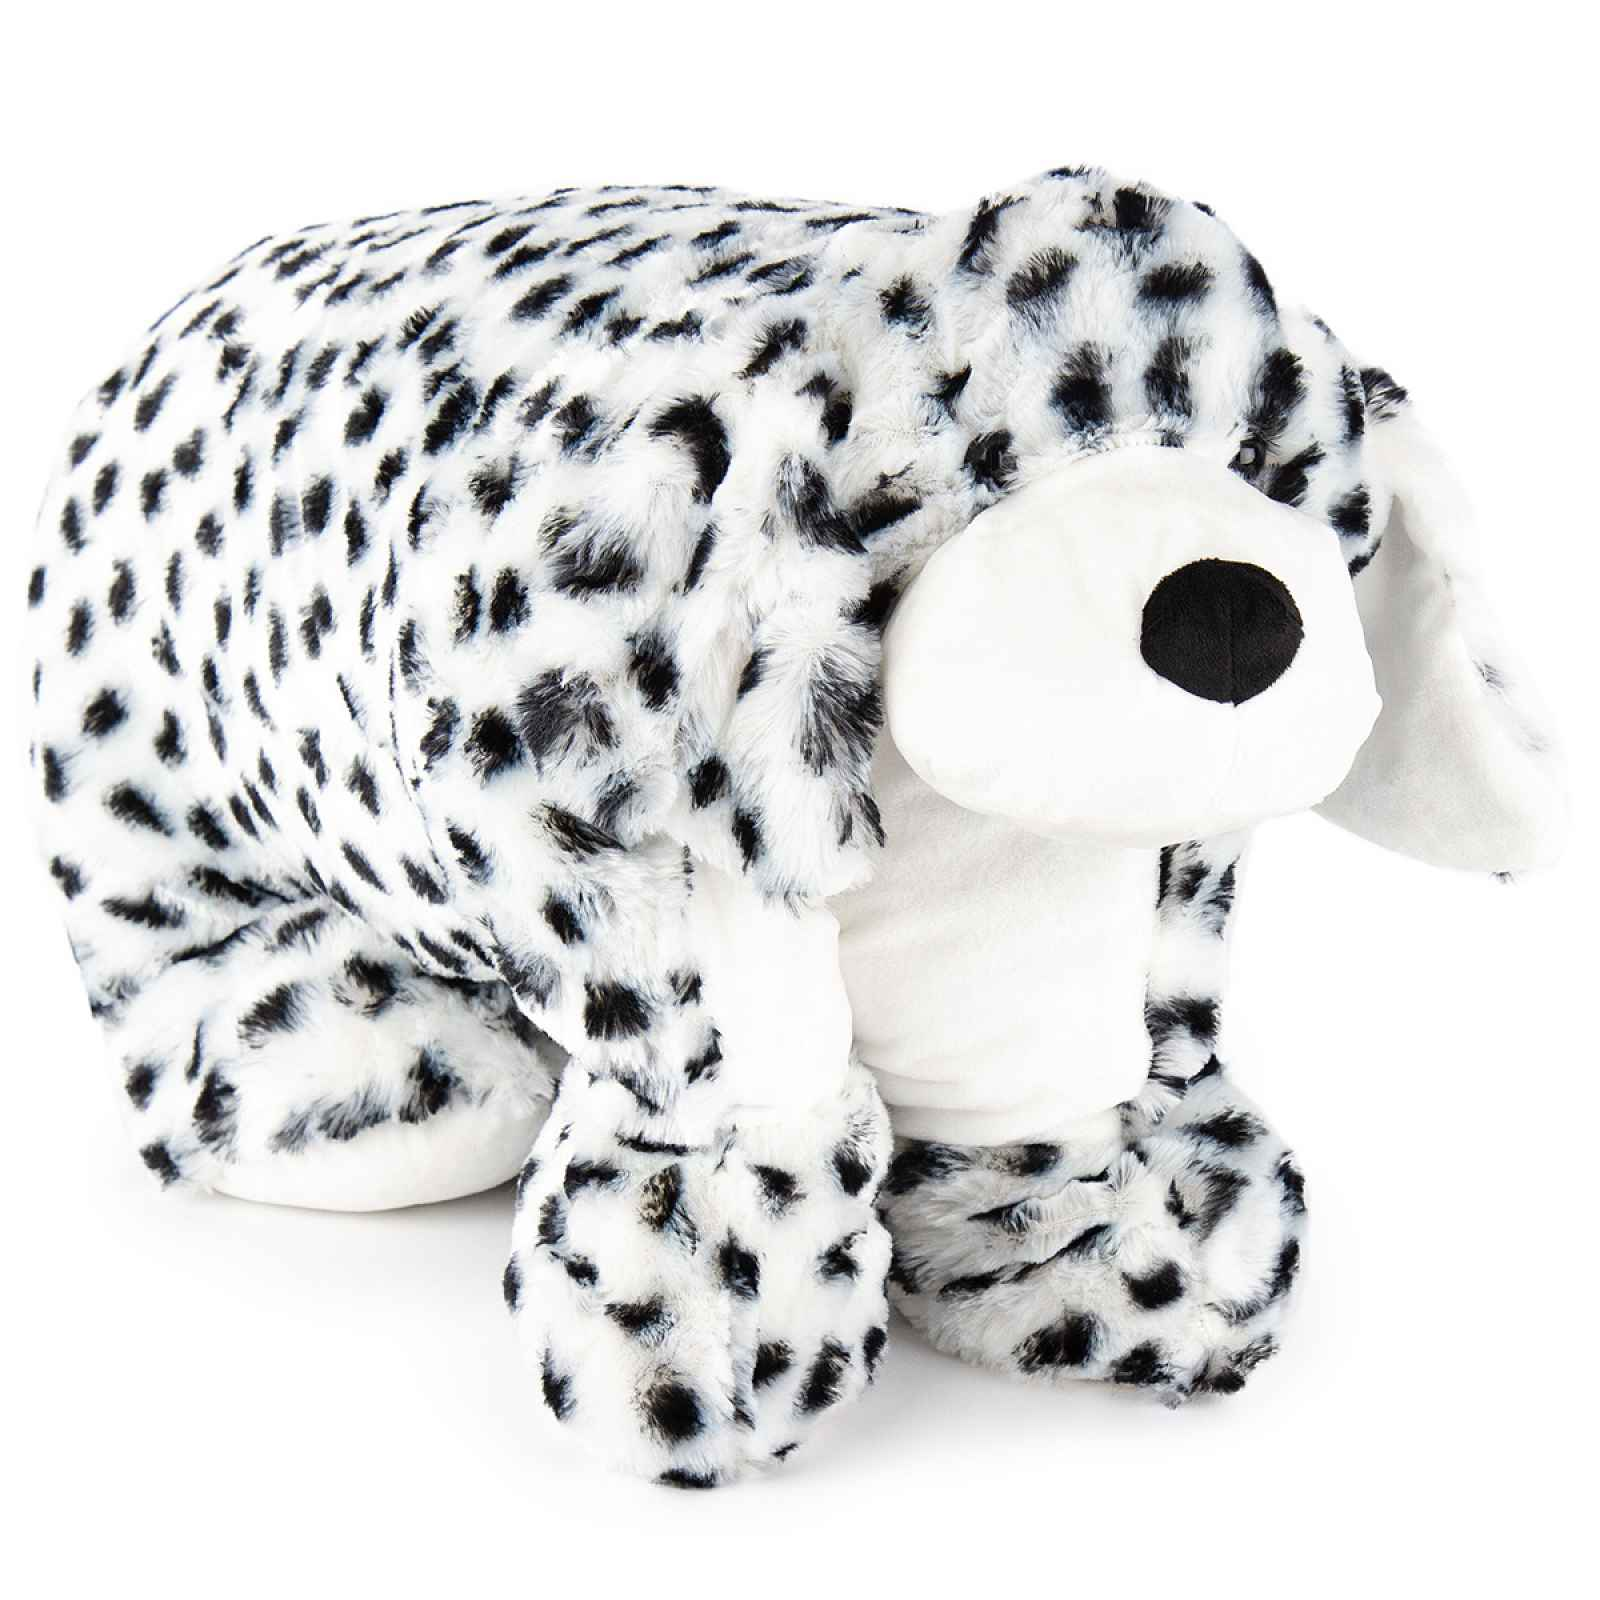 Bo-Ma Trading Plyšový dalmatin s knoflíkem, 55 x 75 cm